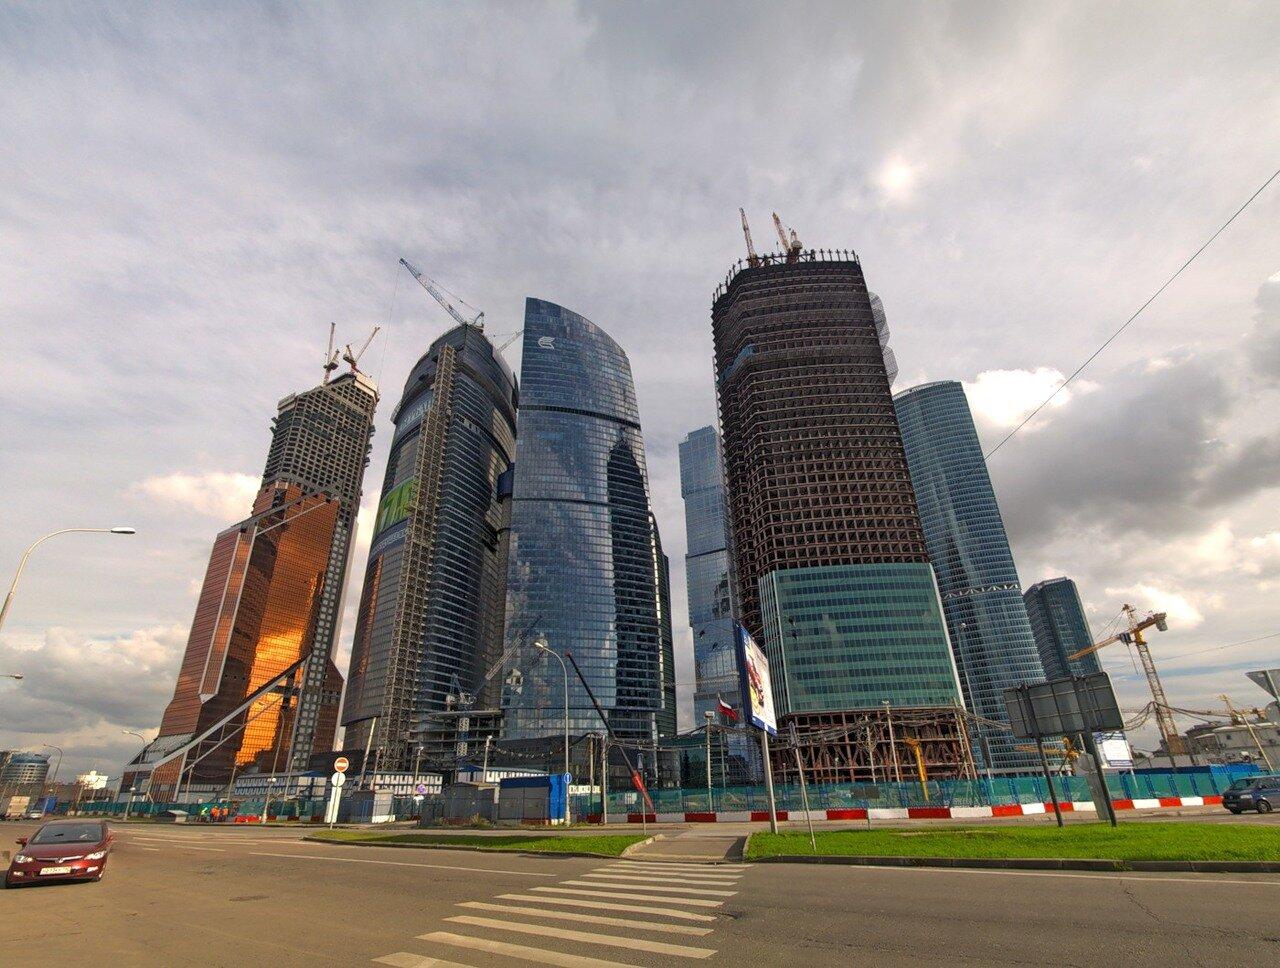 http://img-fotki.yandex.ru/get/4612/50484535.56/0_5409a_bd810b4c_XXXL.jpg